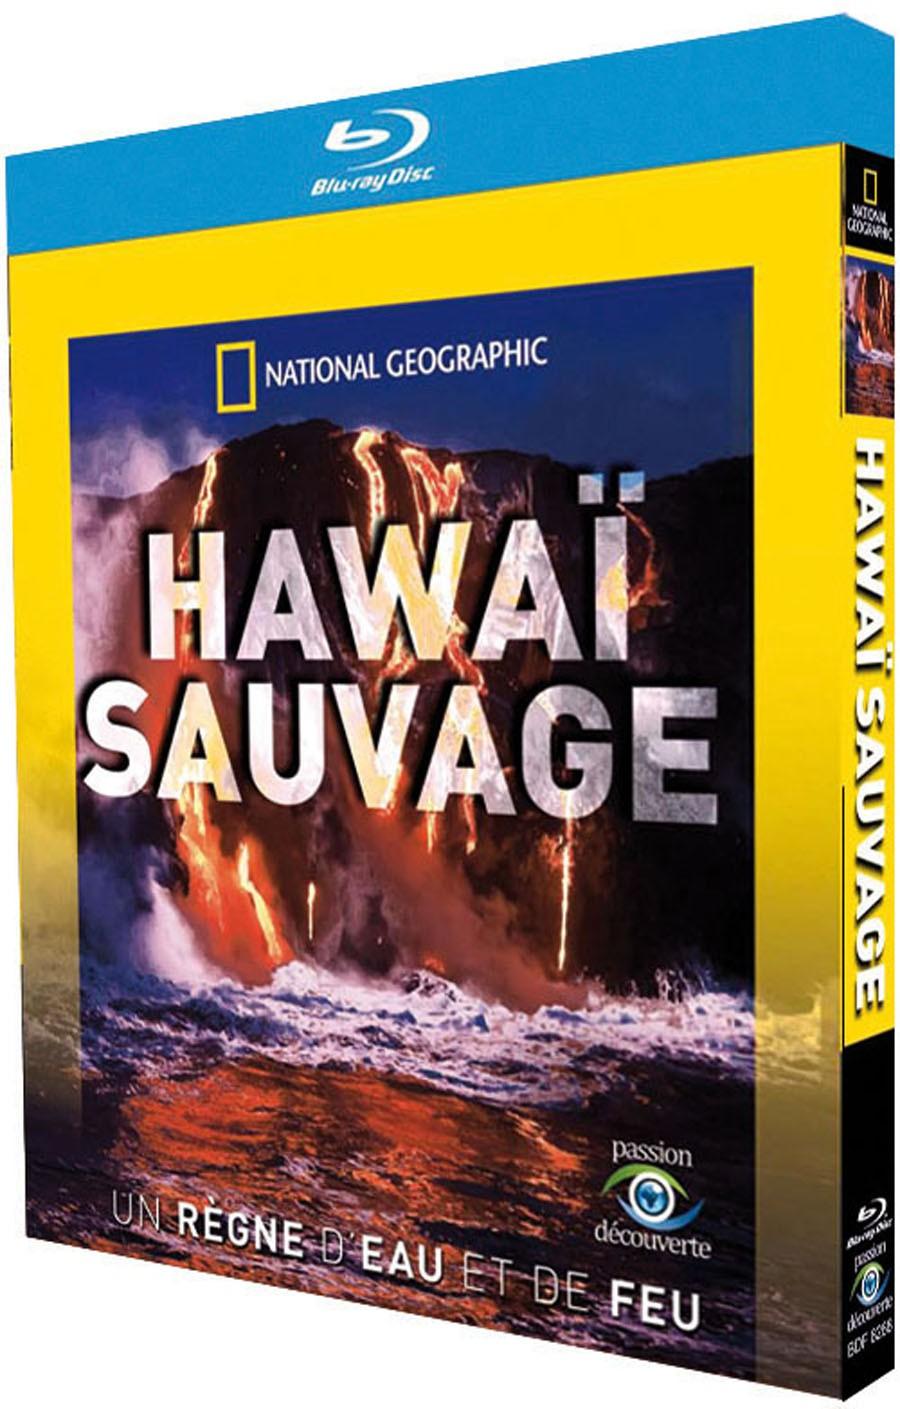 NATIONAL GEOGRAPHIC - HAWAÏ SAUVAGE